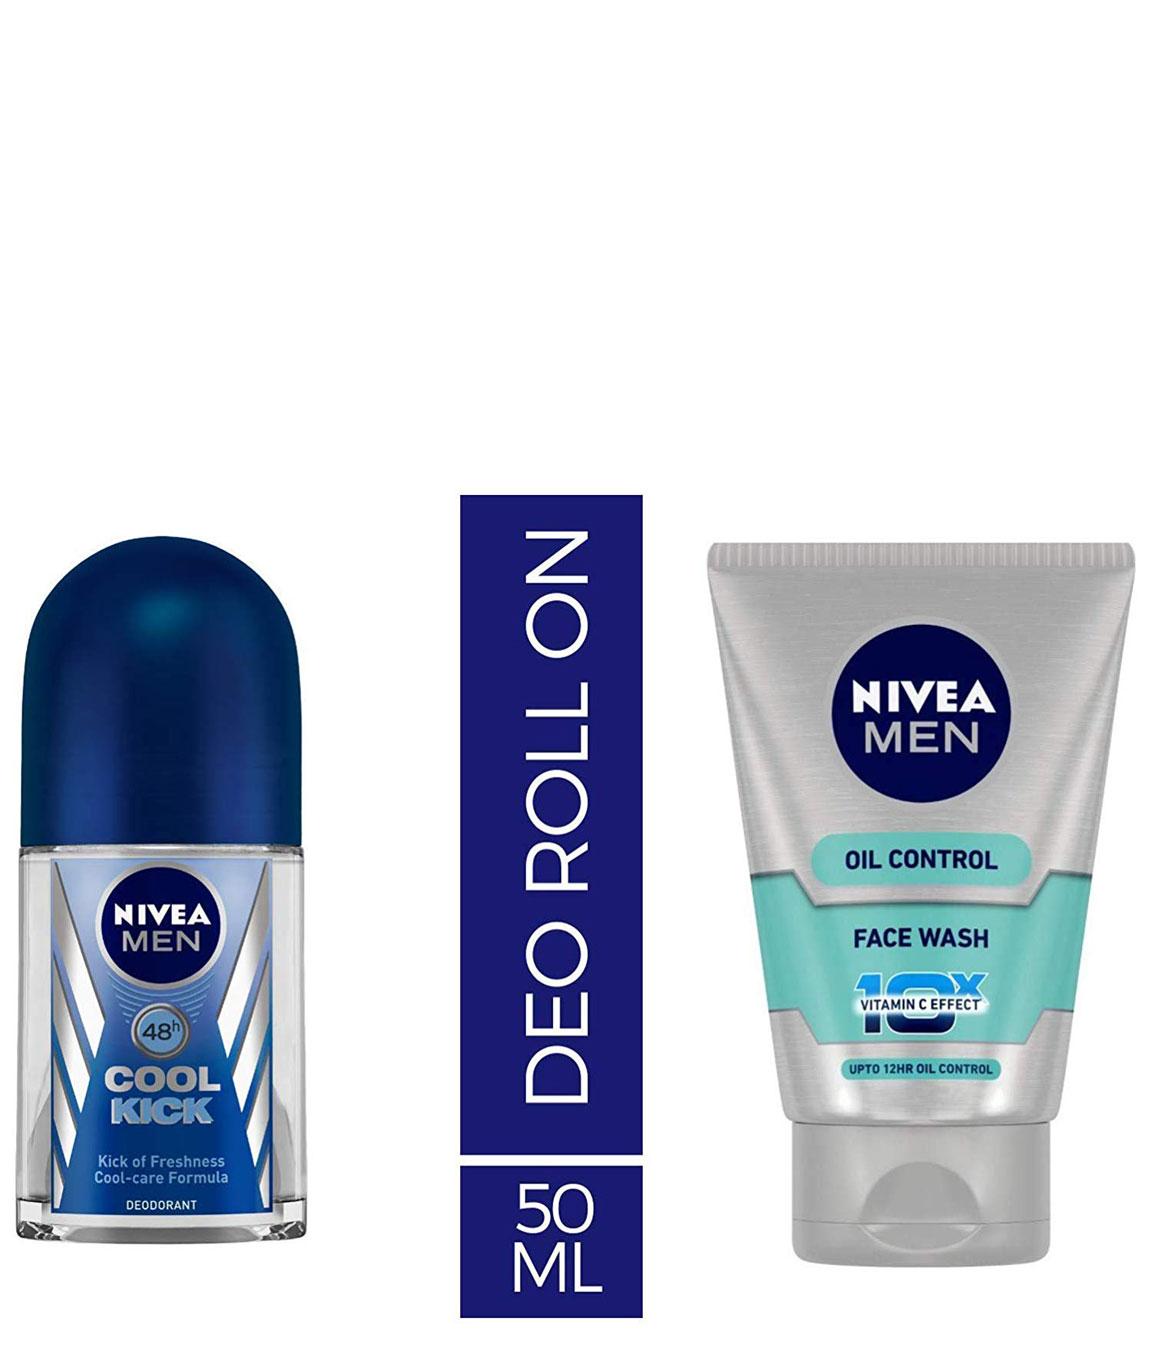 Nivea Deodrant Roll On, Cool Kick, 50ml and NIVEA MEN Face Wash, Oil Control With Vitamin C, 100ml